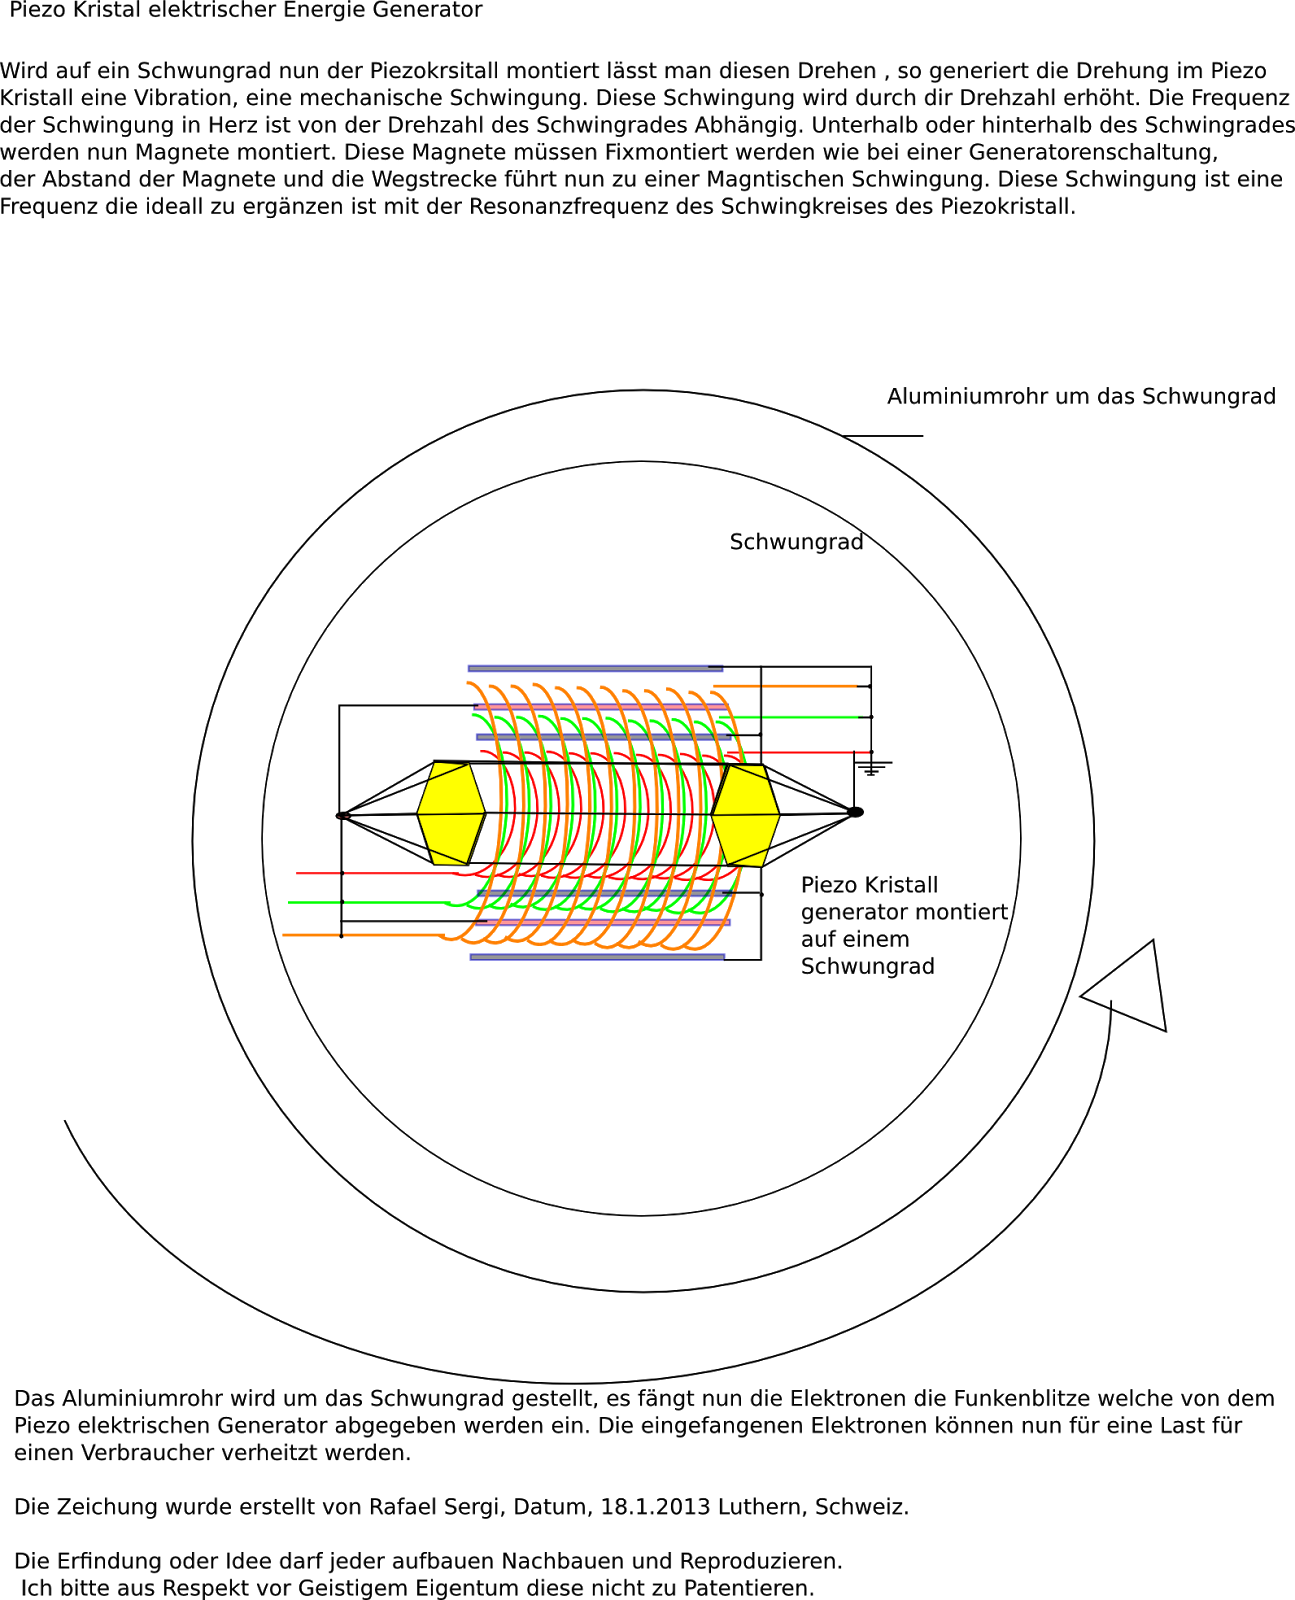 Contemporary Strom Technik Lebenslauf Component - FORTSETZUNG ...